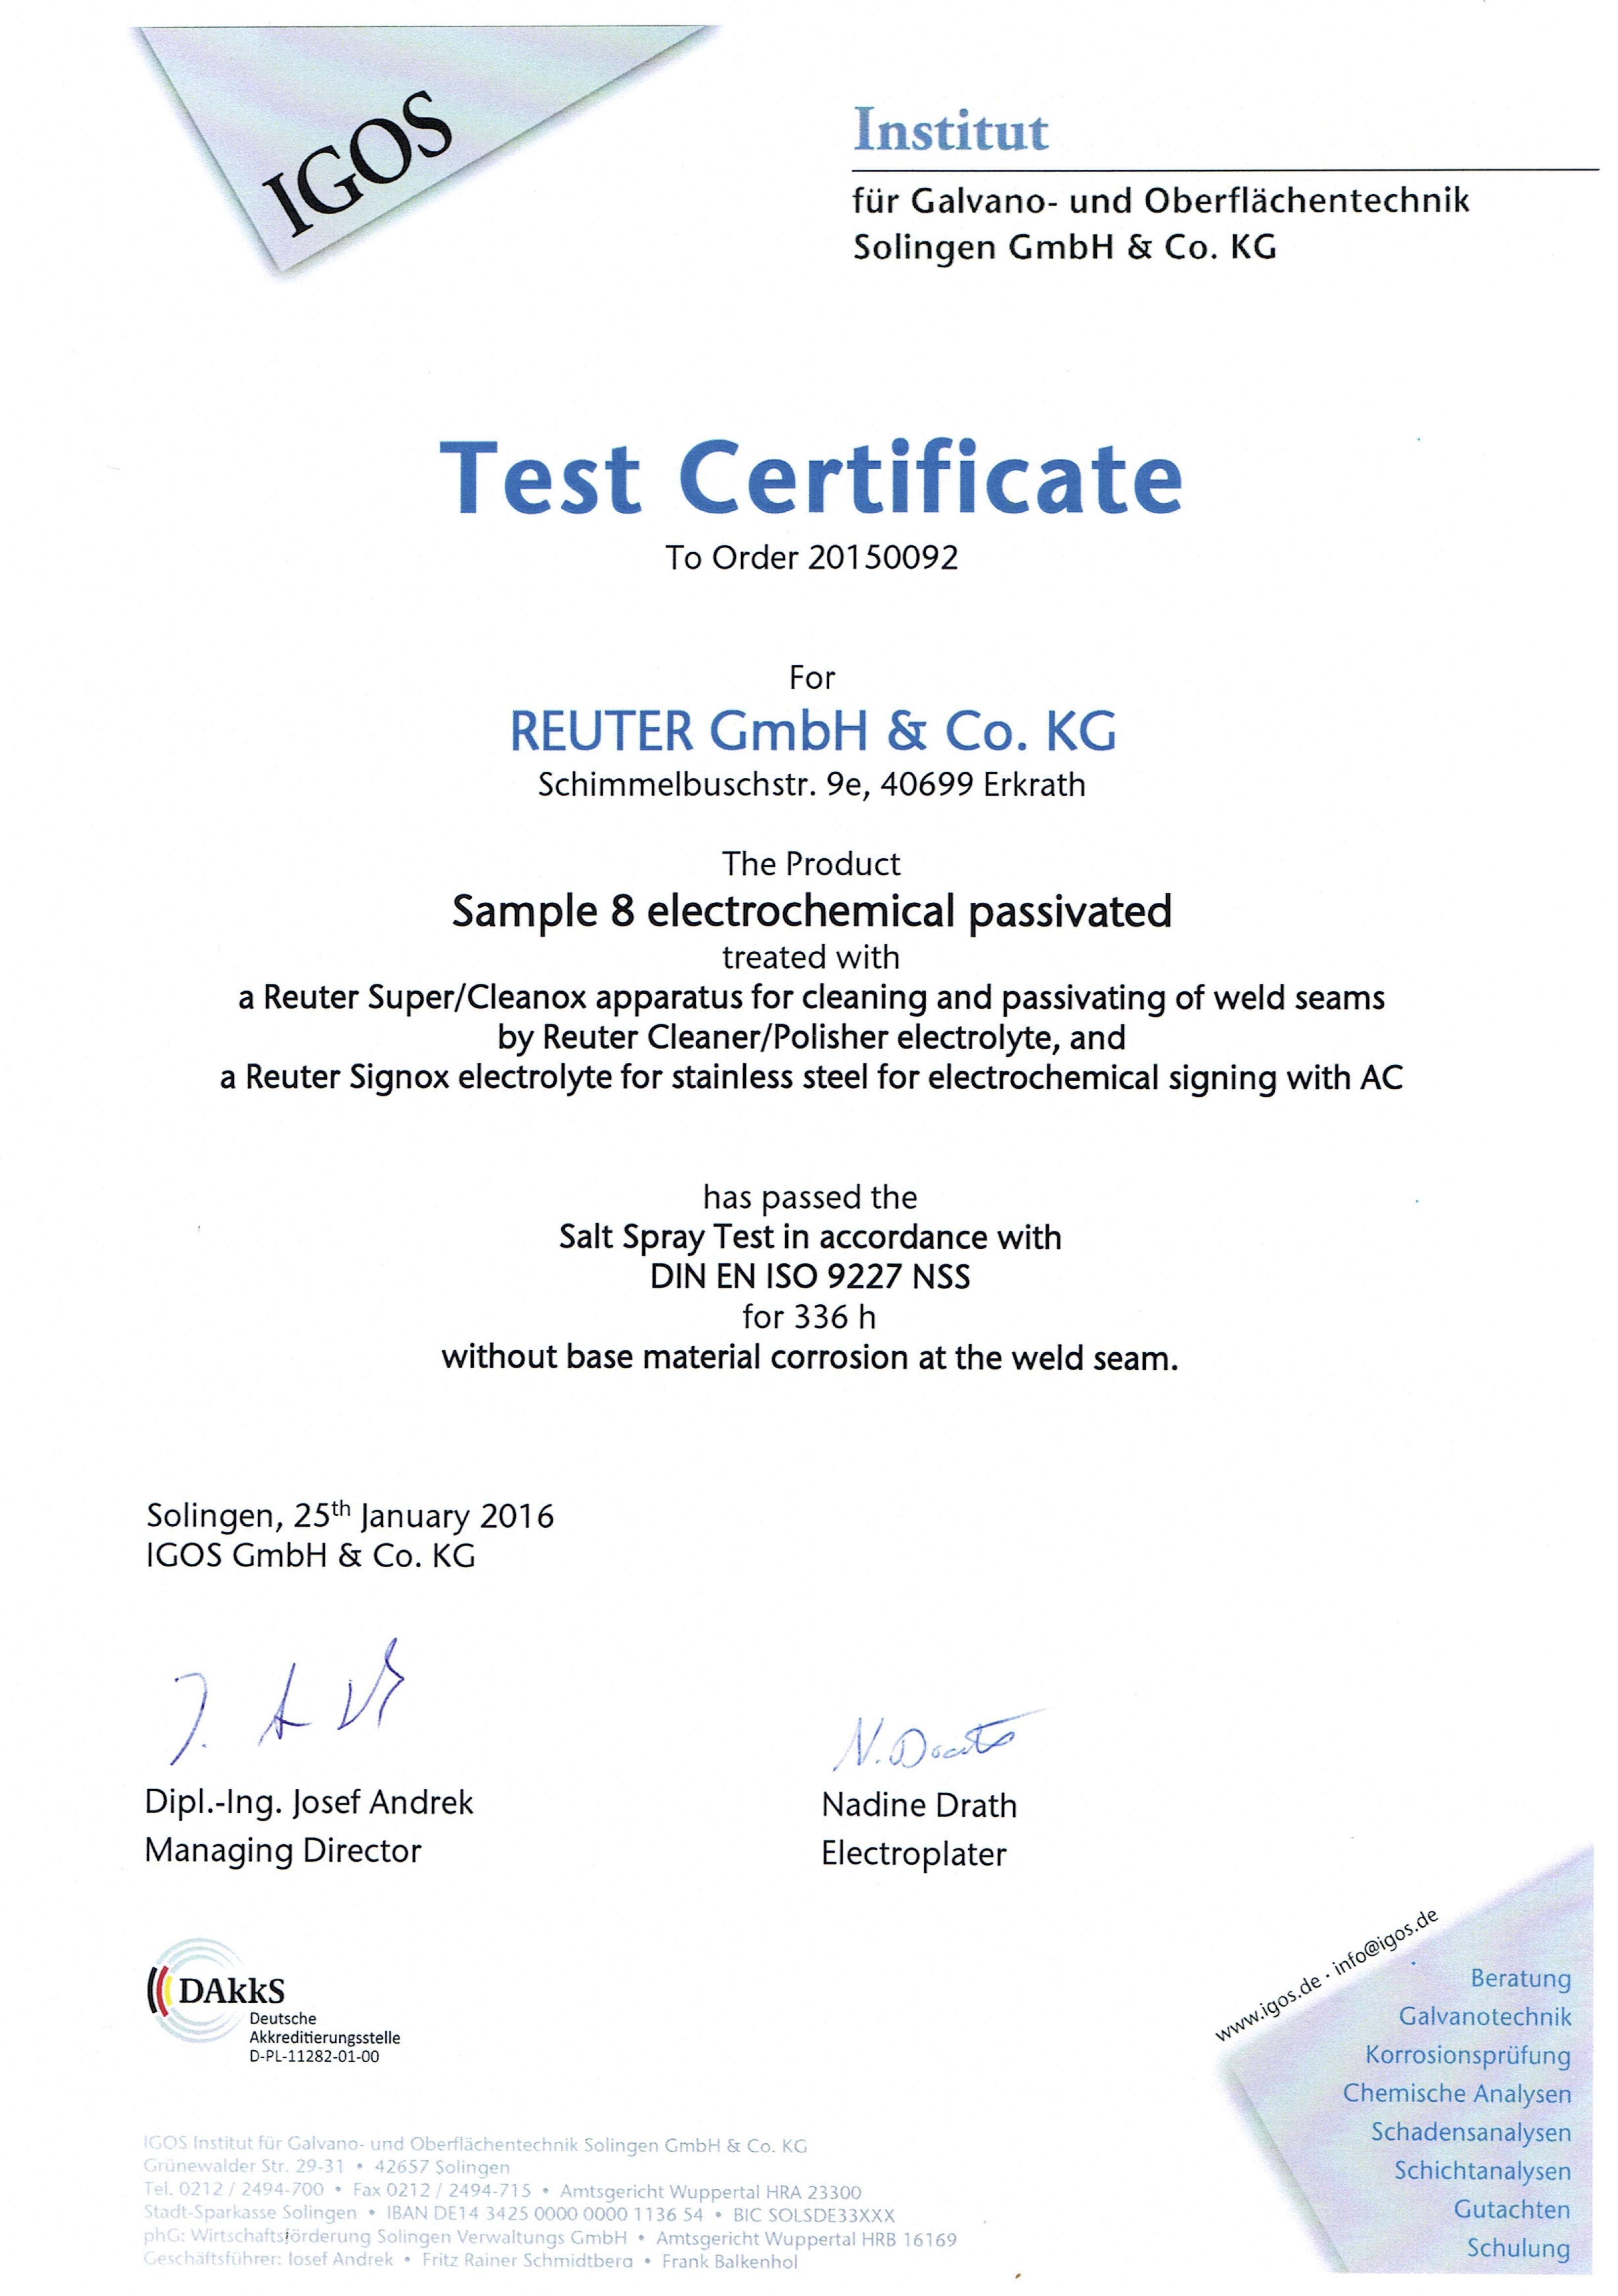 Test Certificate IGOS28012016